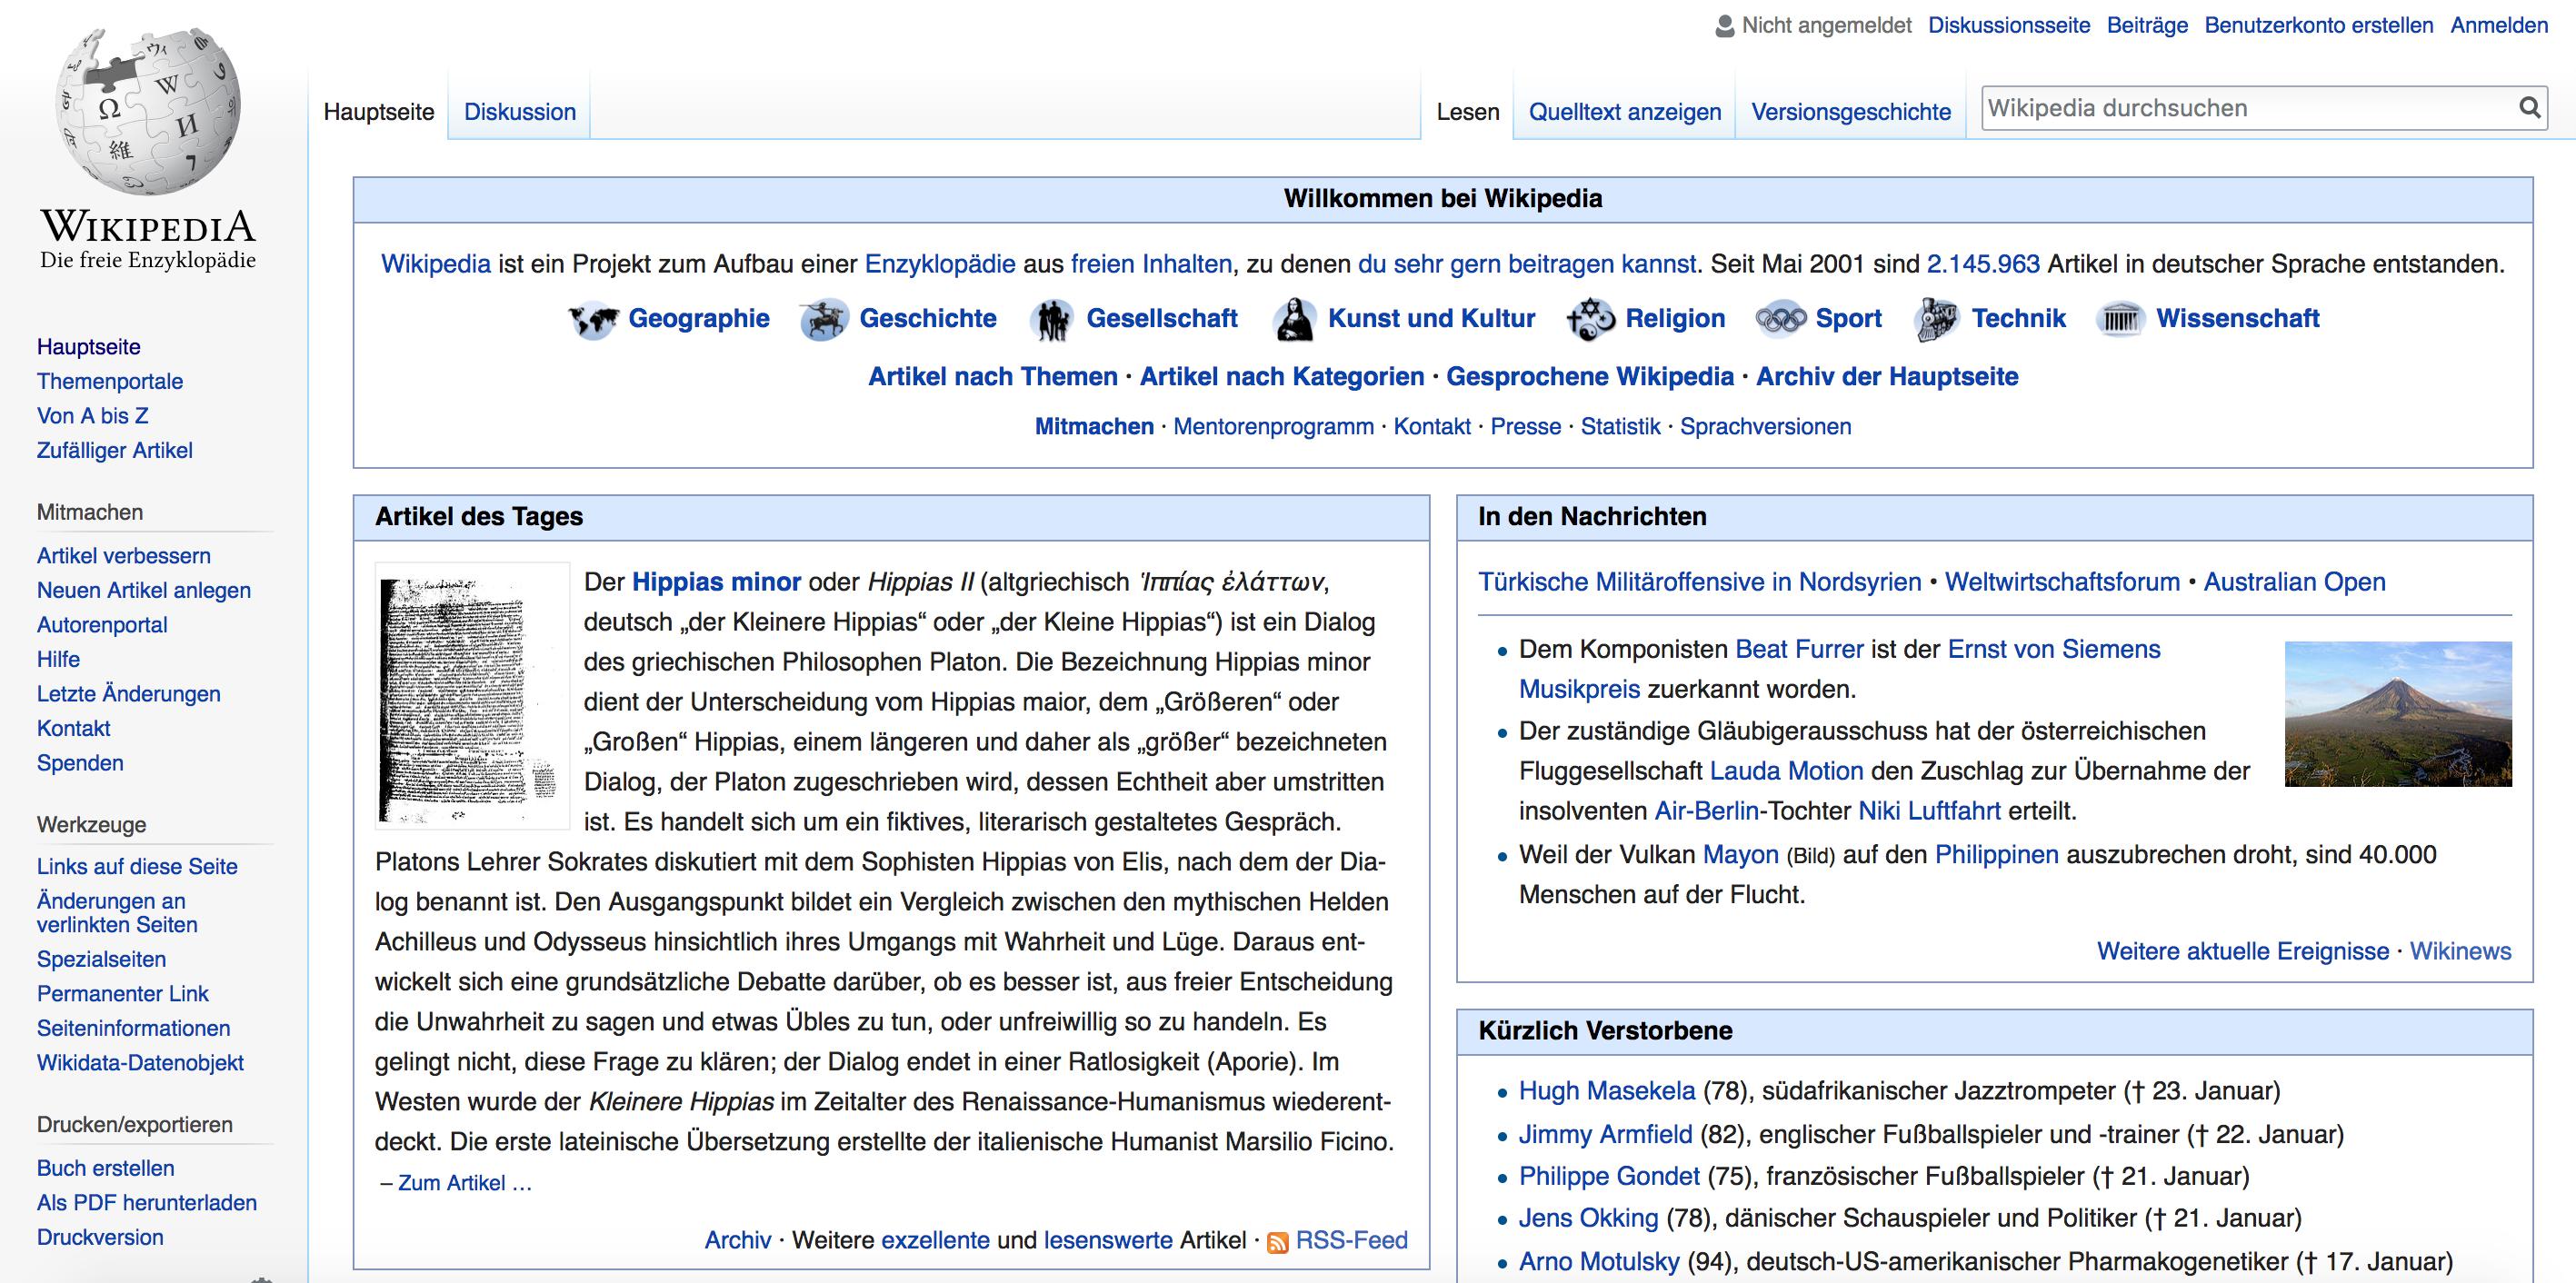 Wikipedia ist kein Corporate Intranet